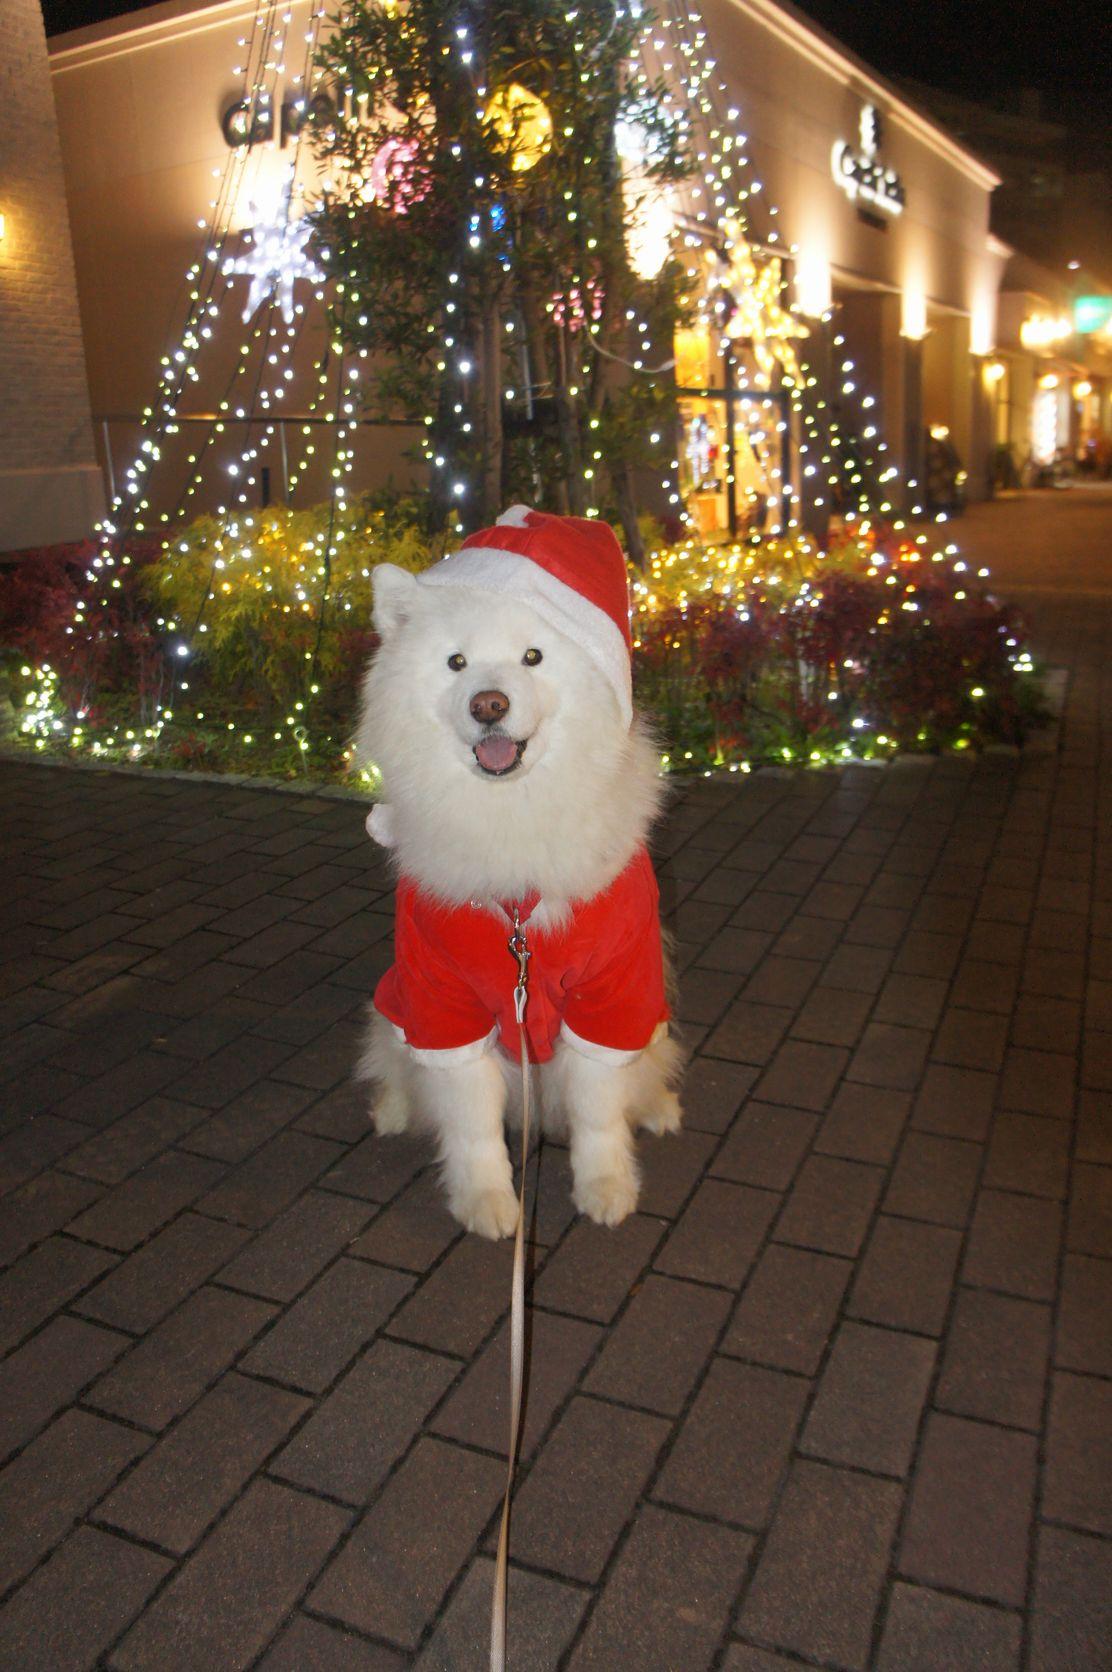 Merry Christmas_f0128542_0311666.jpg